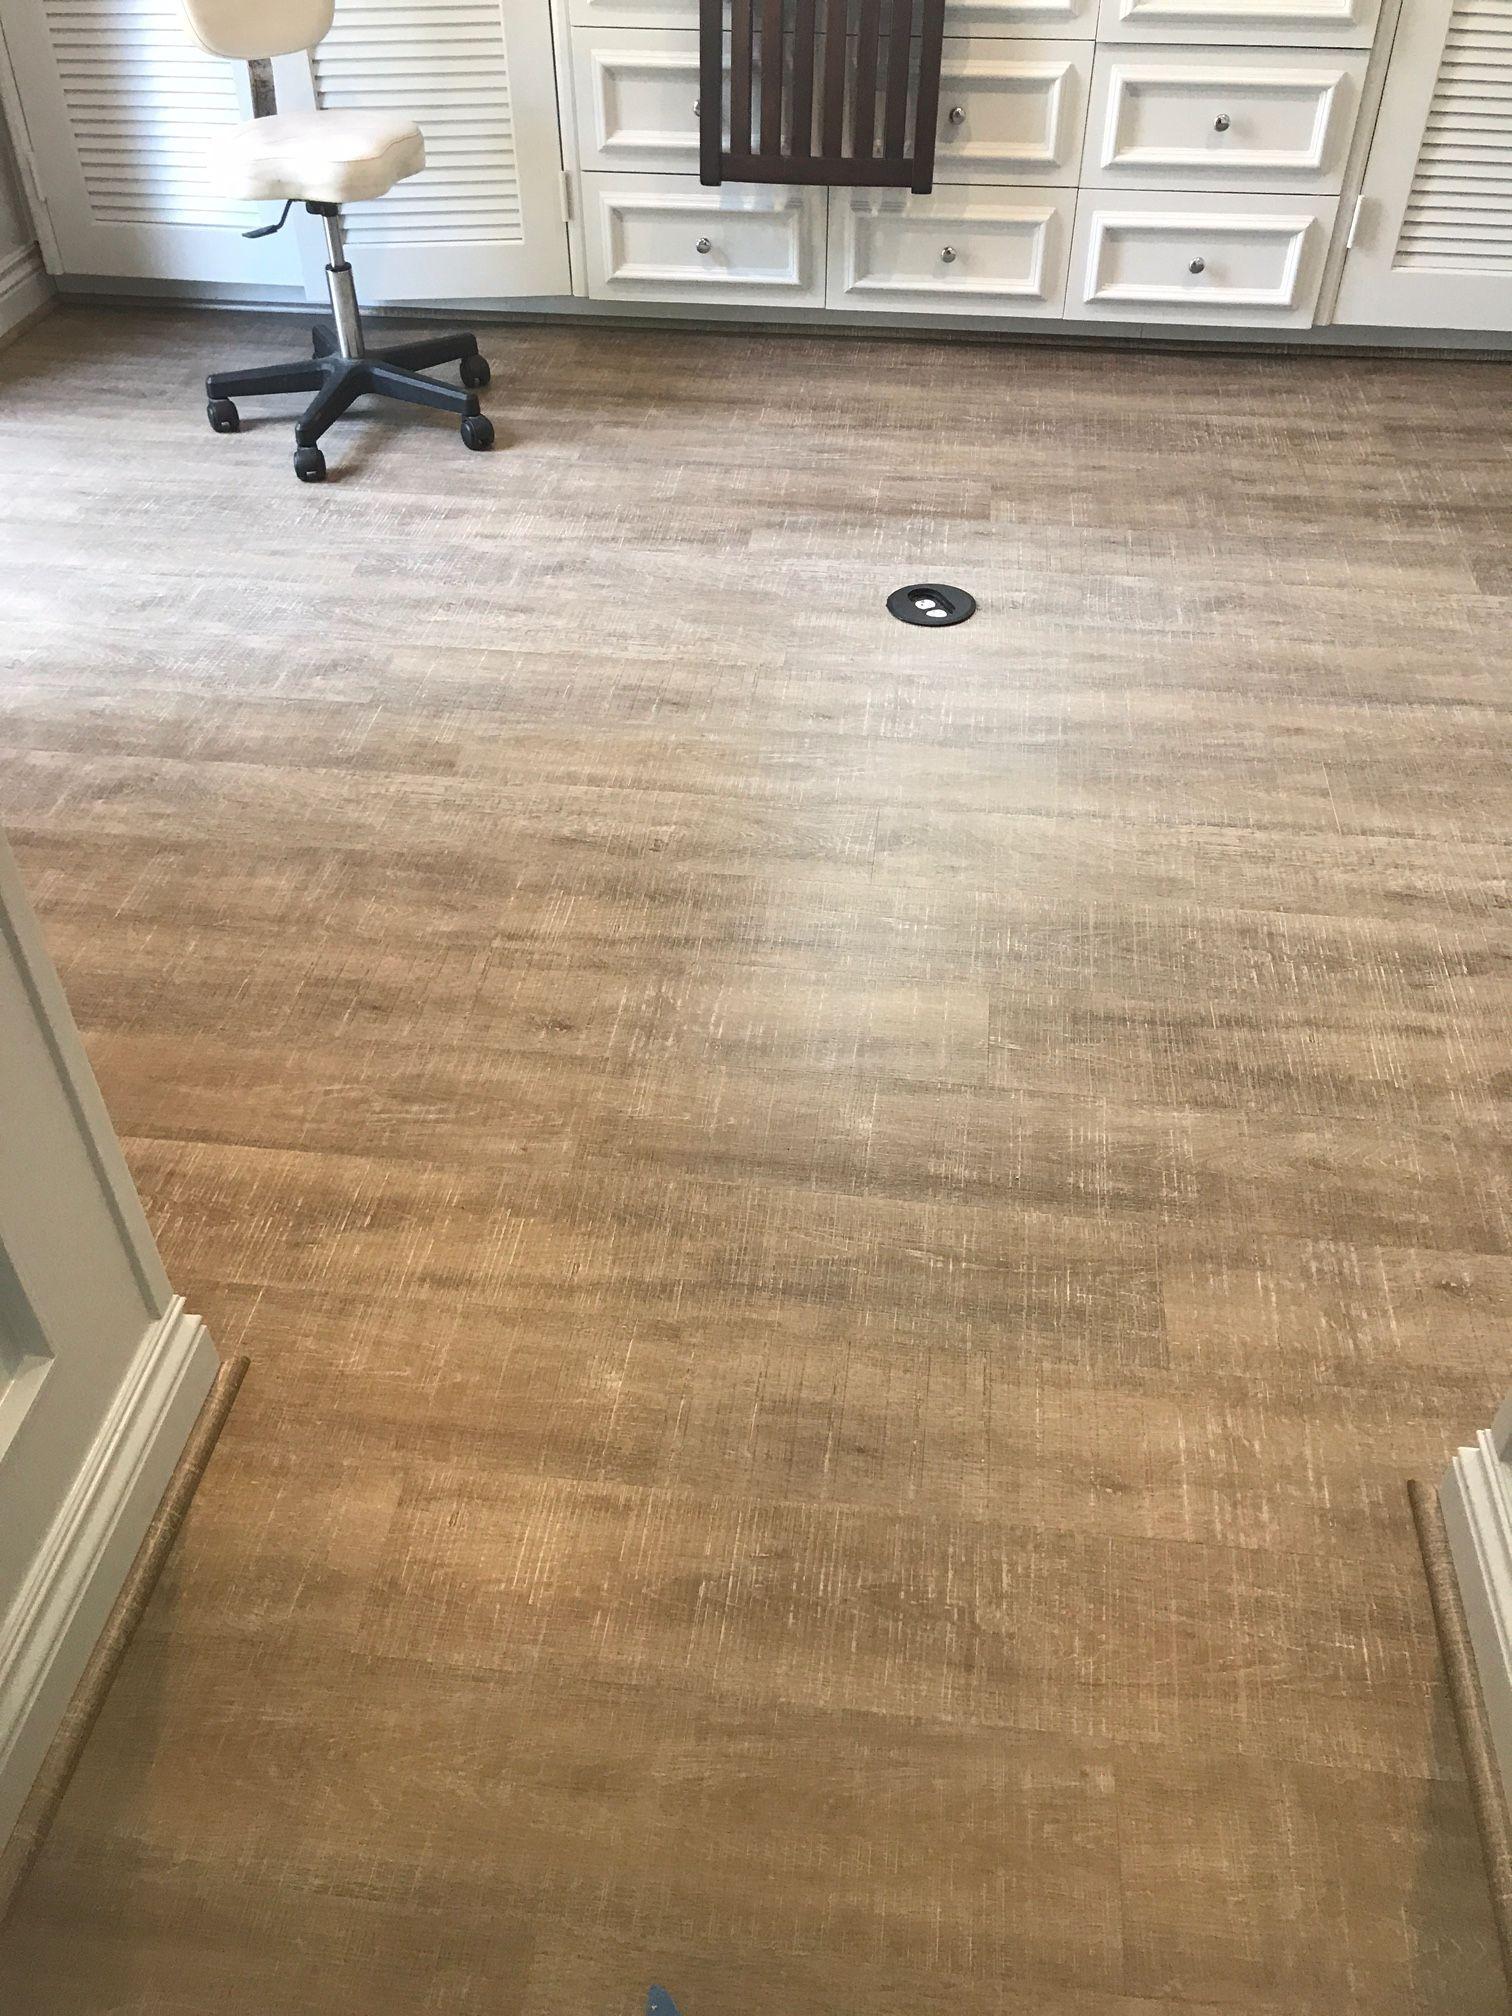 Waterproof laminate flooring pictures ideas expert tips flooring waterproofflooring